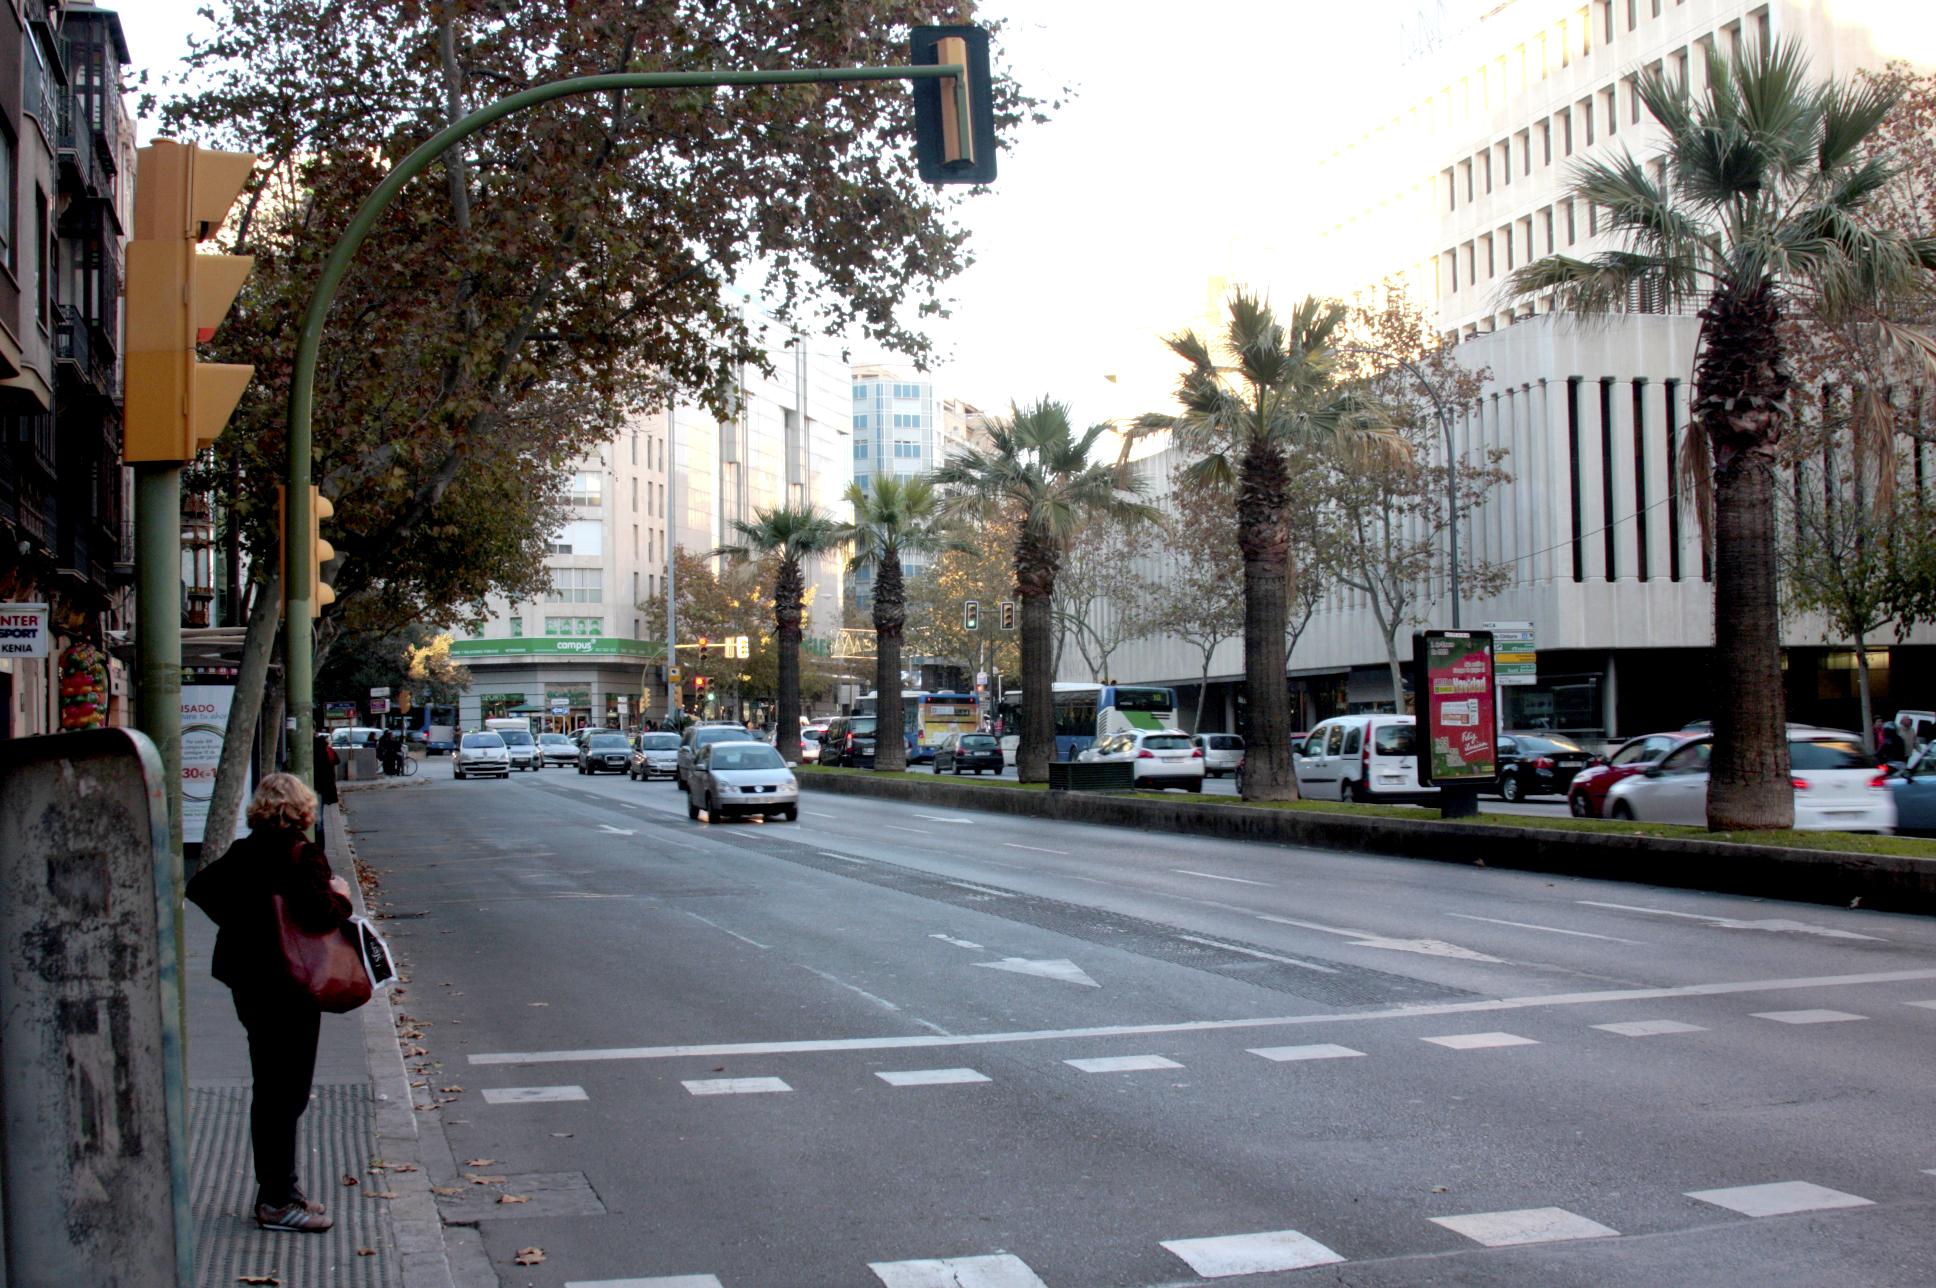 Palma de mallorca mejor ciudad del mundo para vivir para the sunday times pcnpost - Mejores ciudades para vivir en espana ...